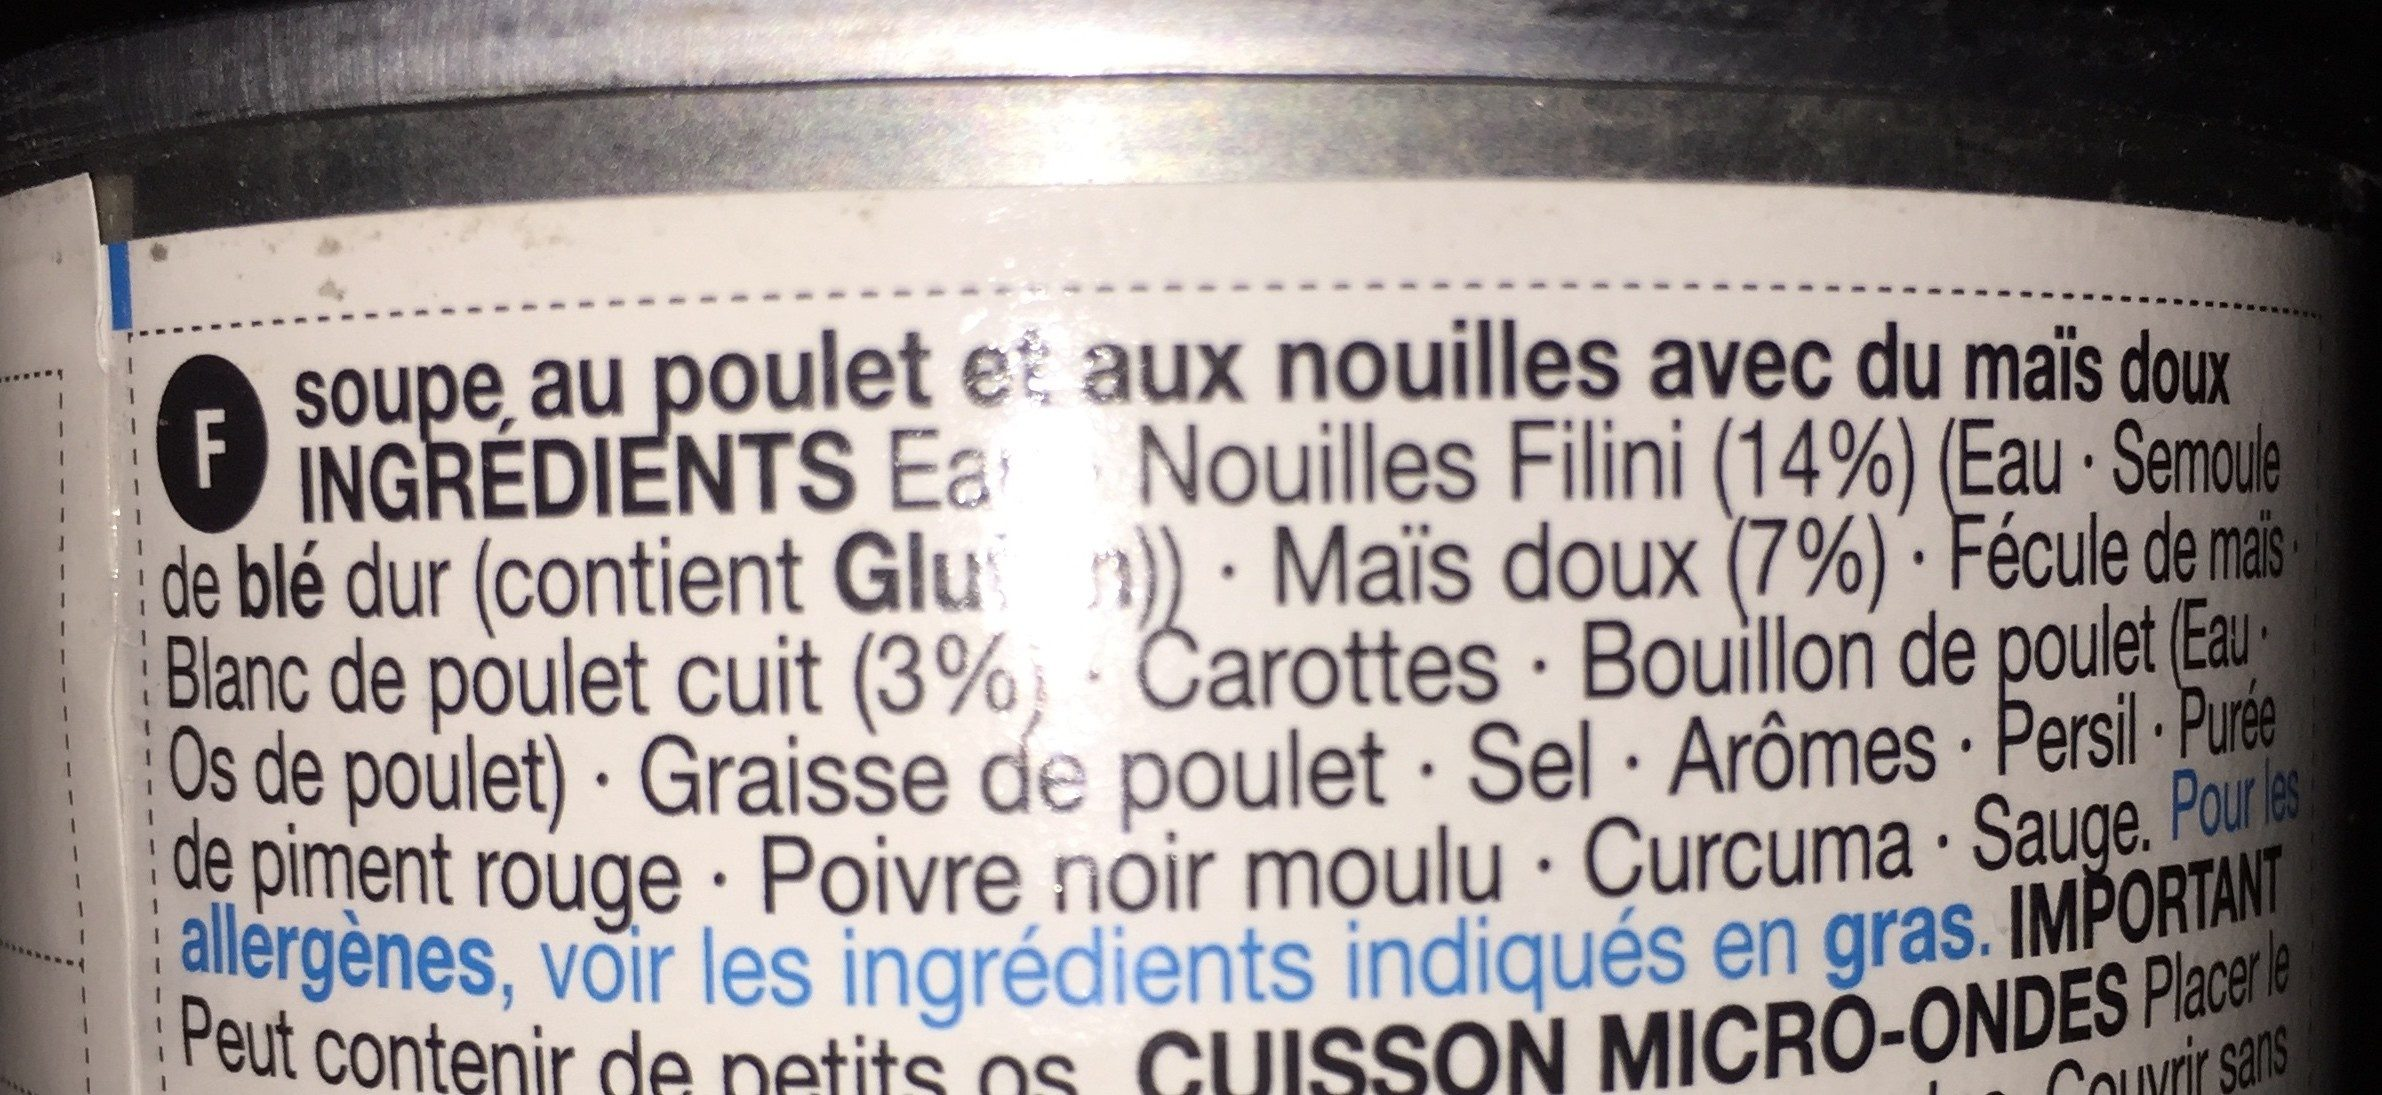 Chicken Noodle - Ingredients - fr